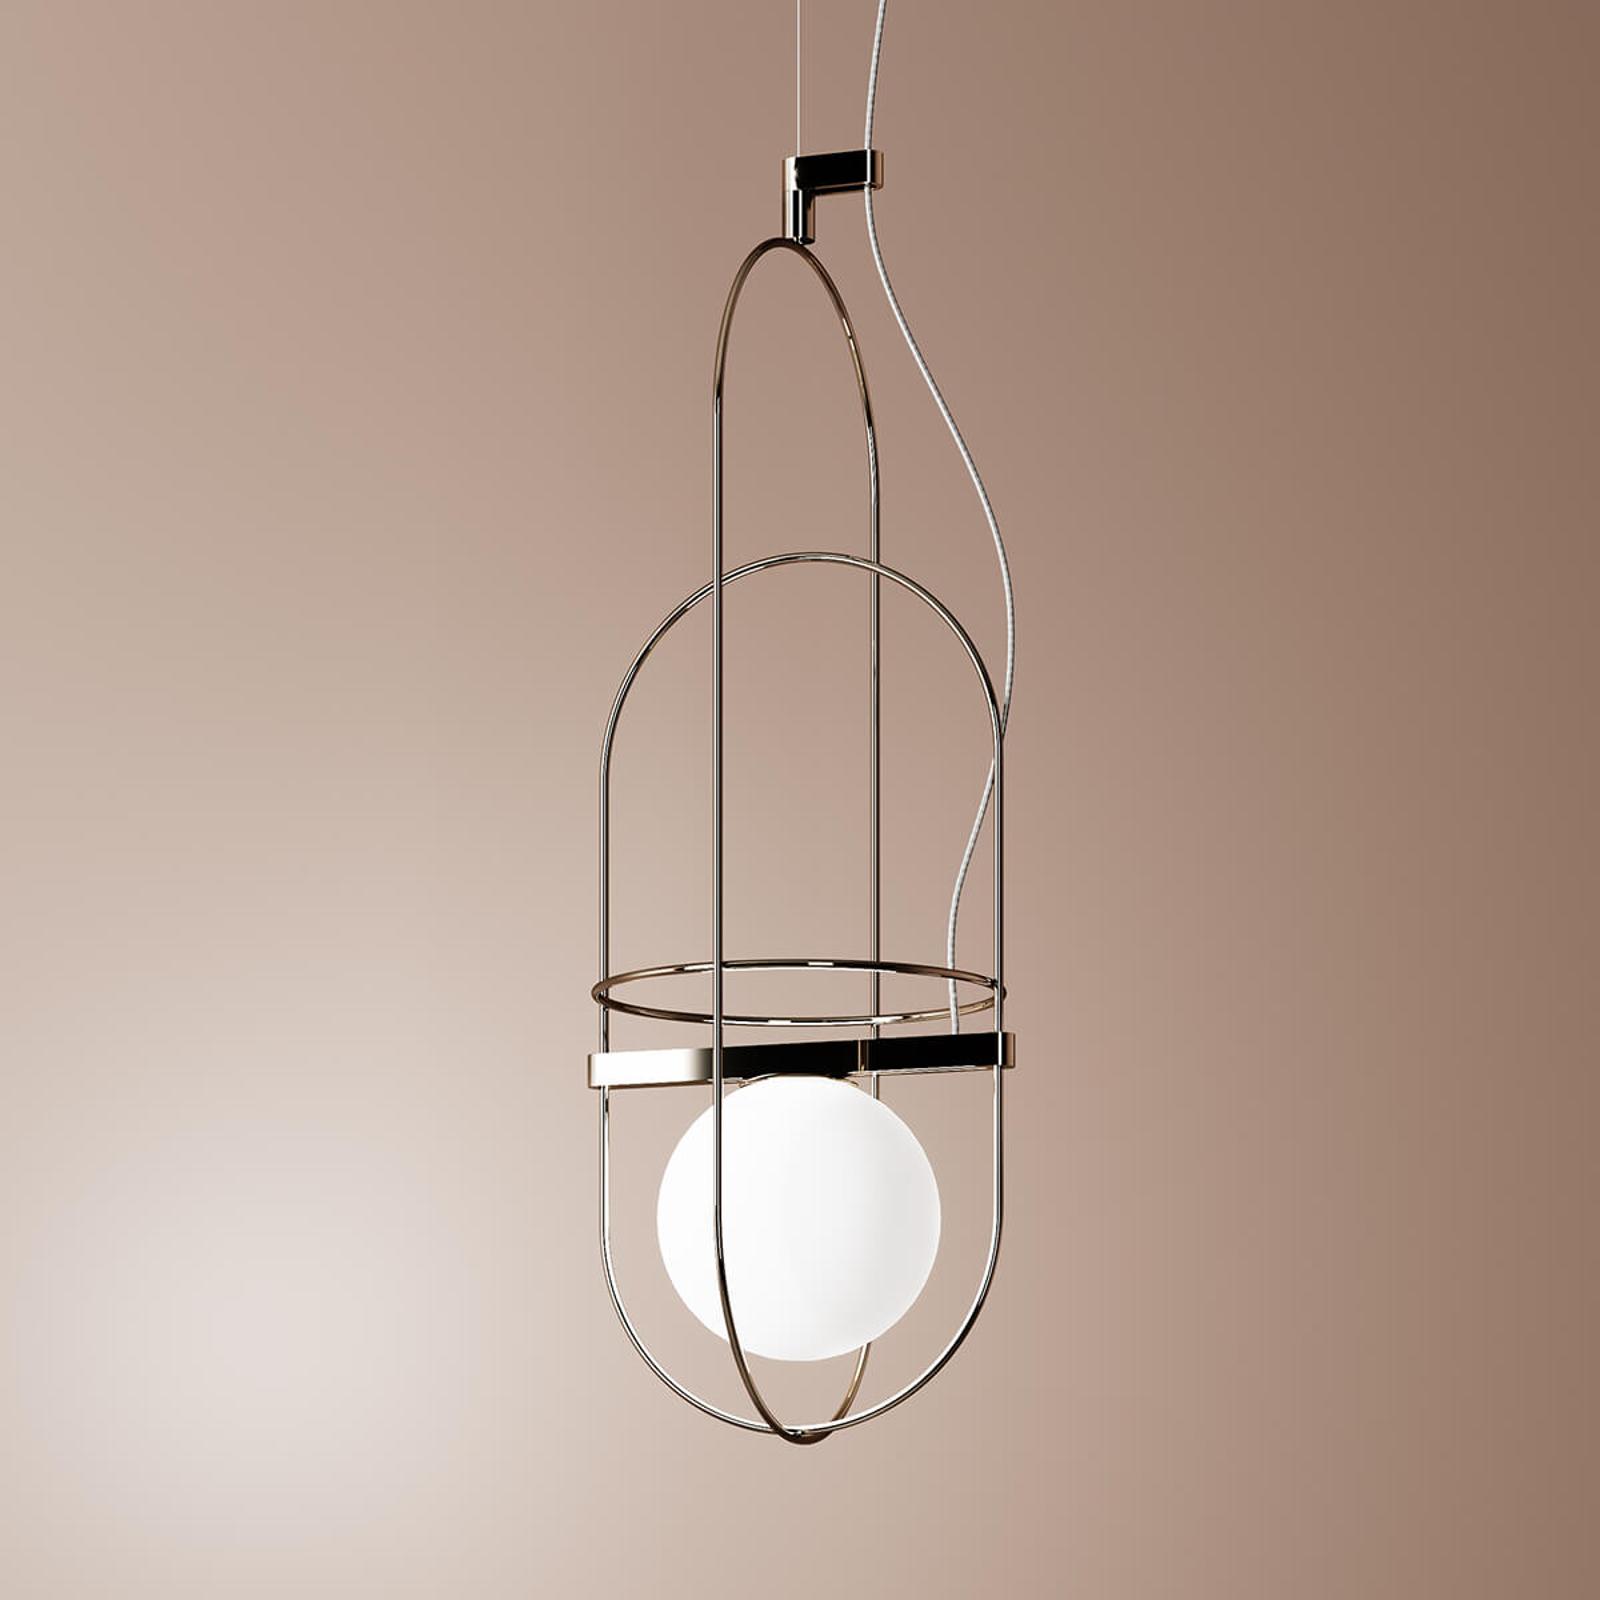 Fontana Arte Setareh - LED Hanglamp in Chroom